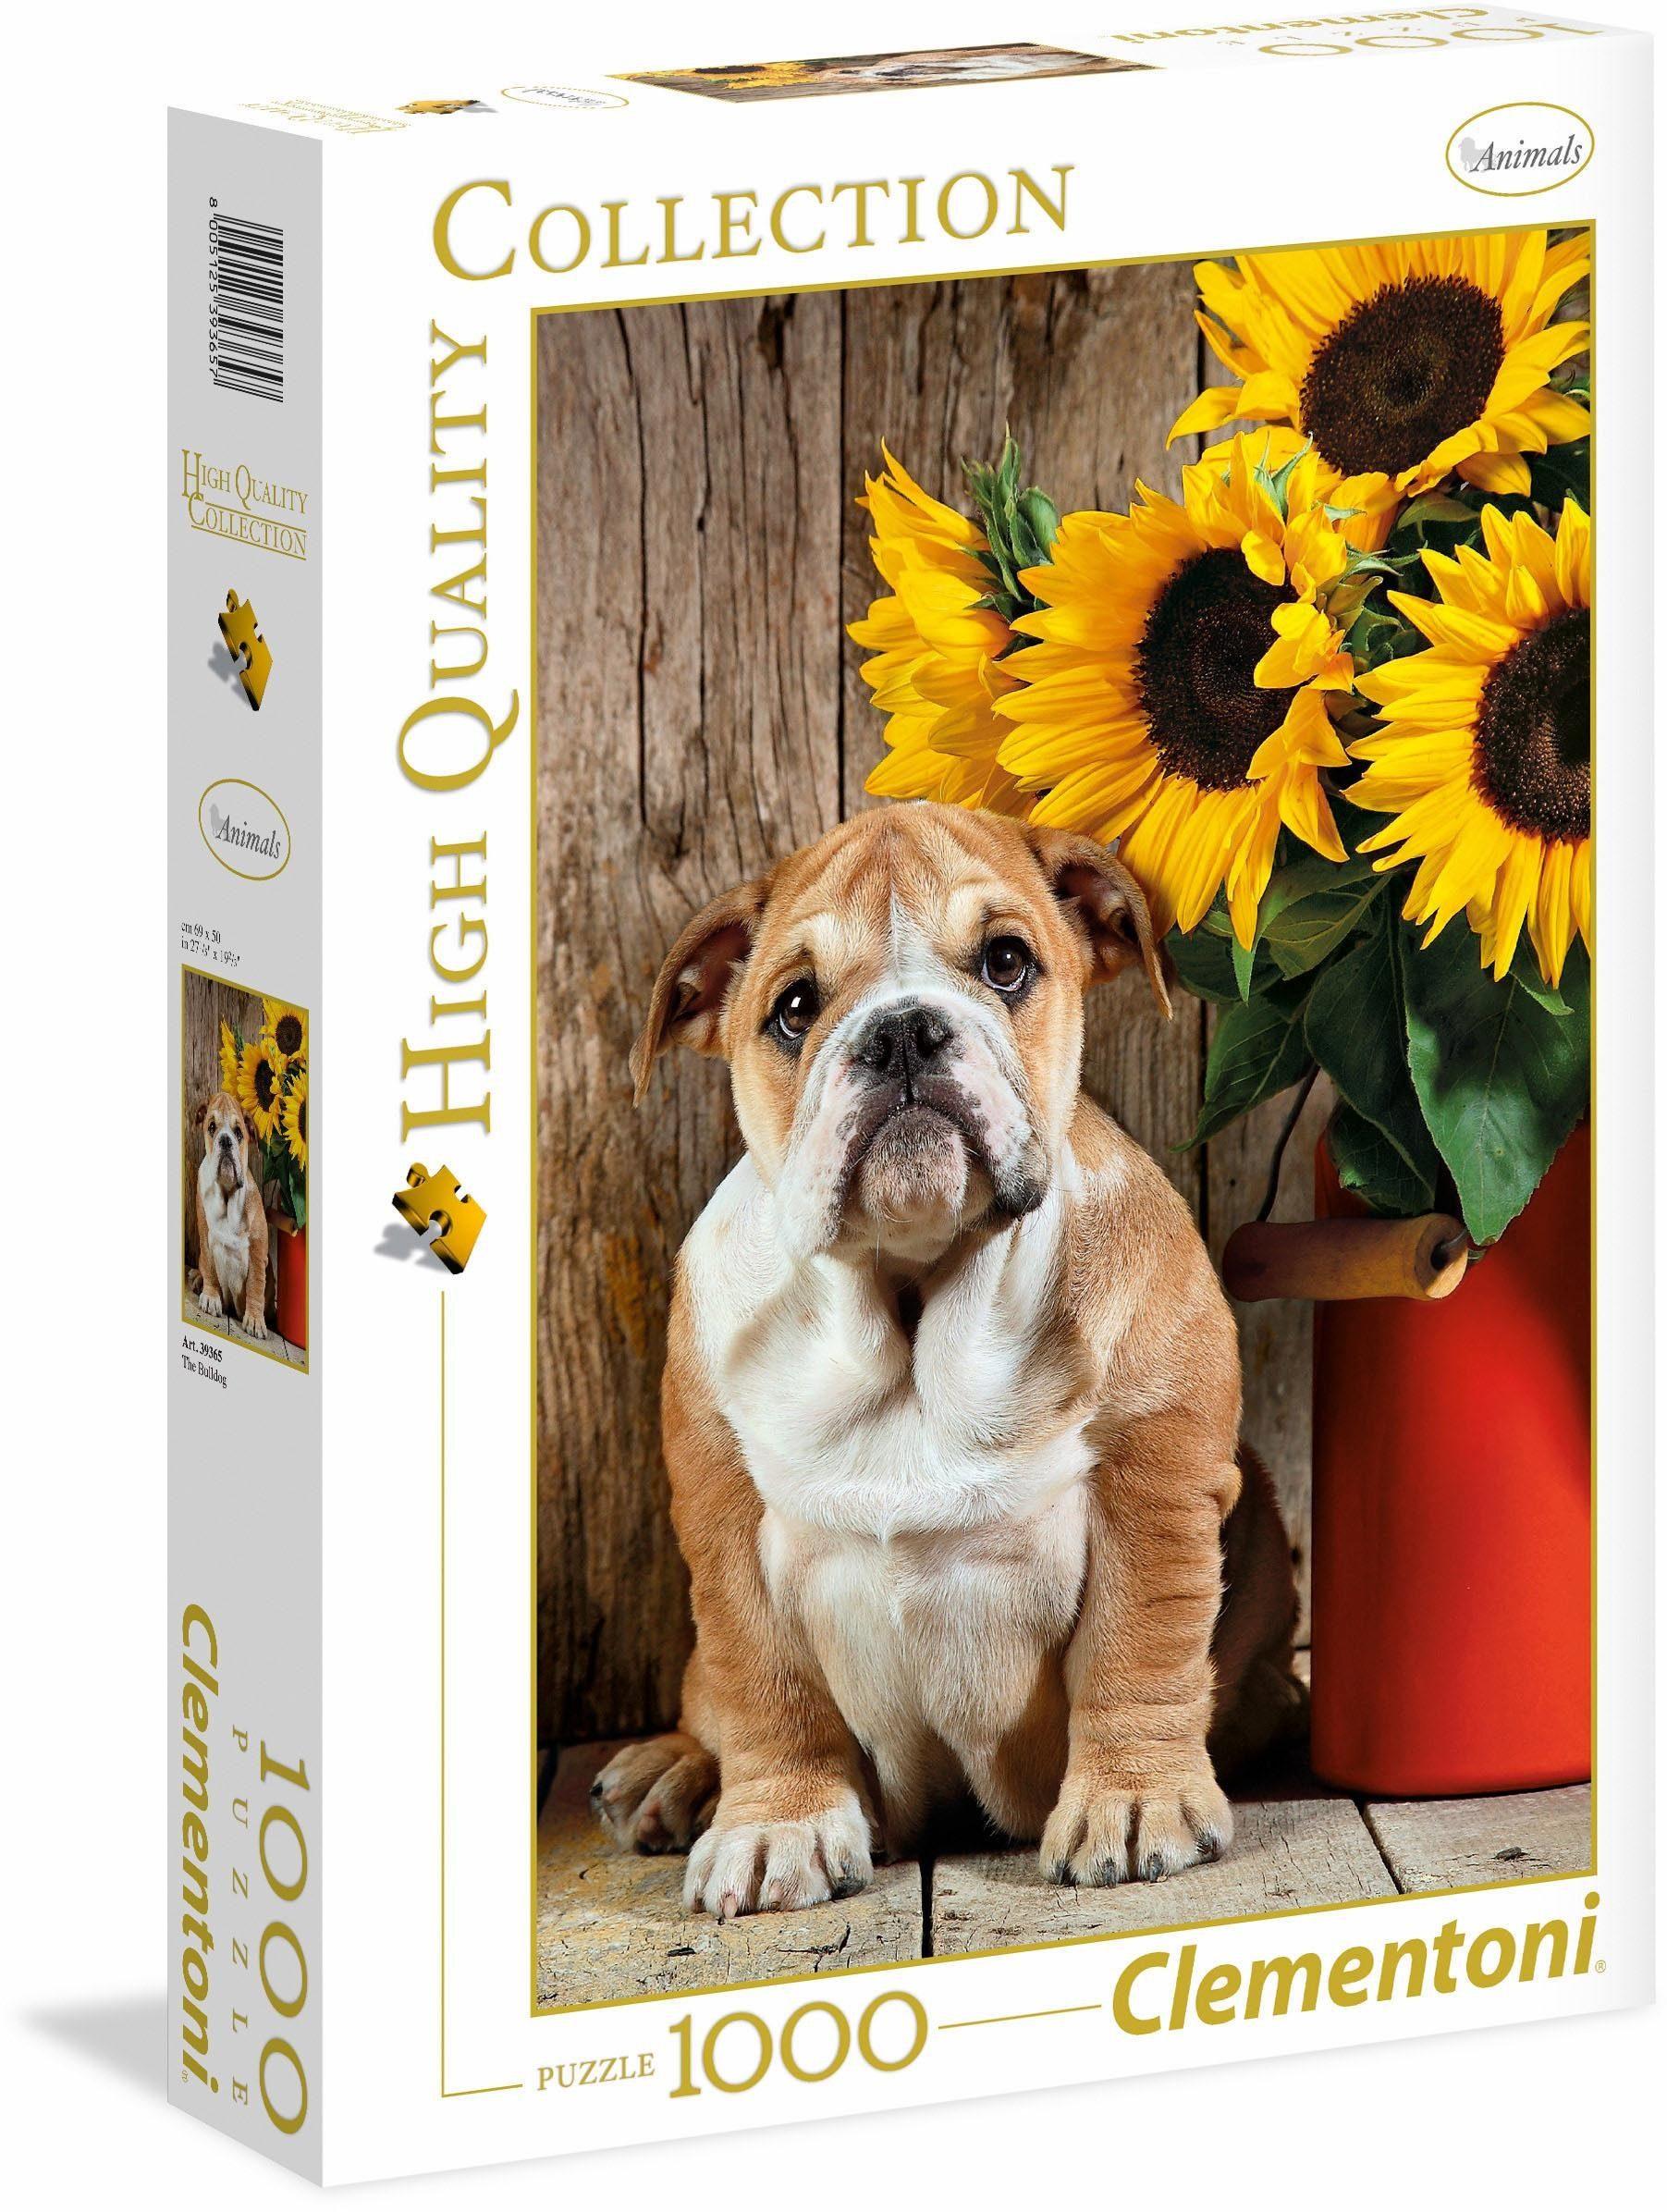 Clementoni Puzzle, 1000 Teile, »Bulldogge«